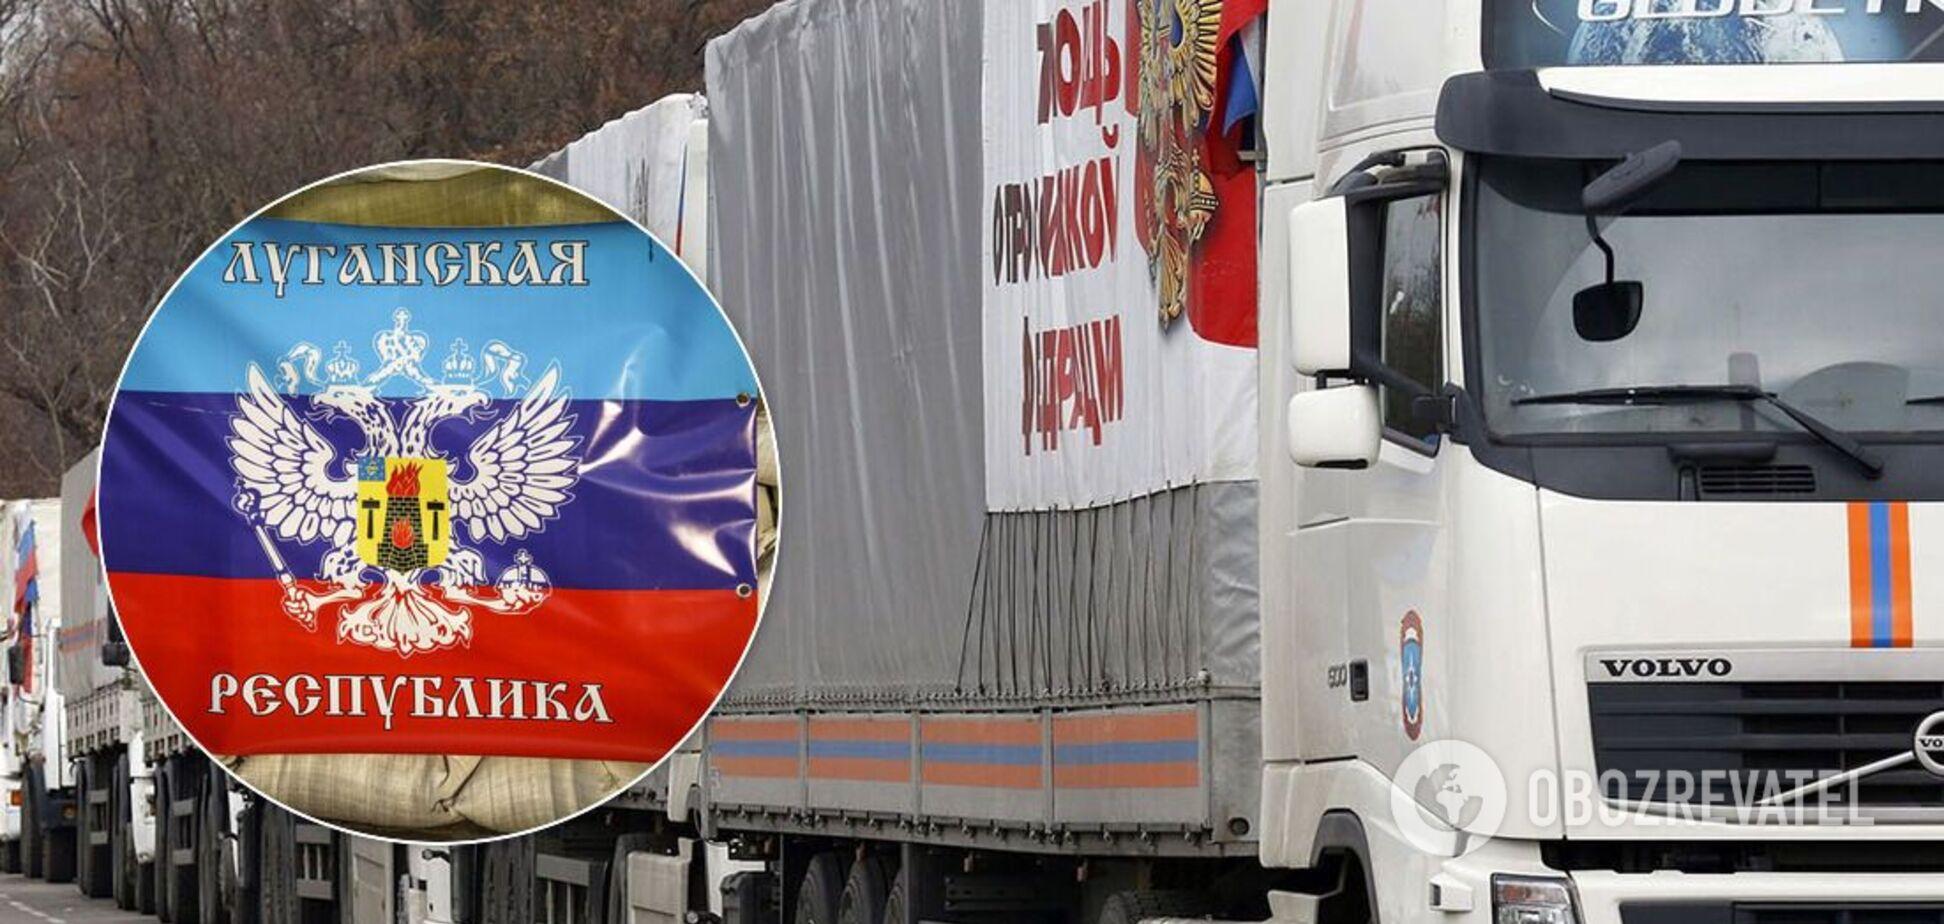 Росія відправила 'гумконвой' в окуповані Луганськ і Донецьк